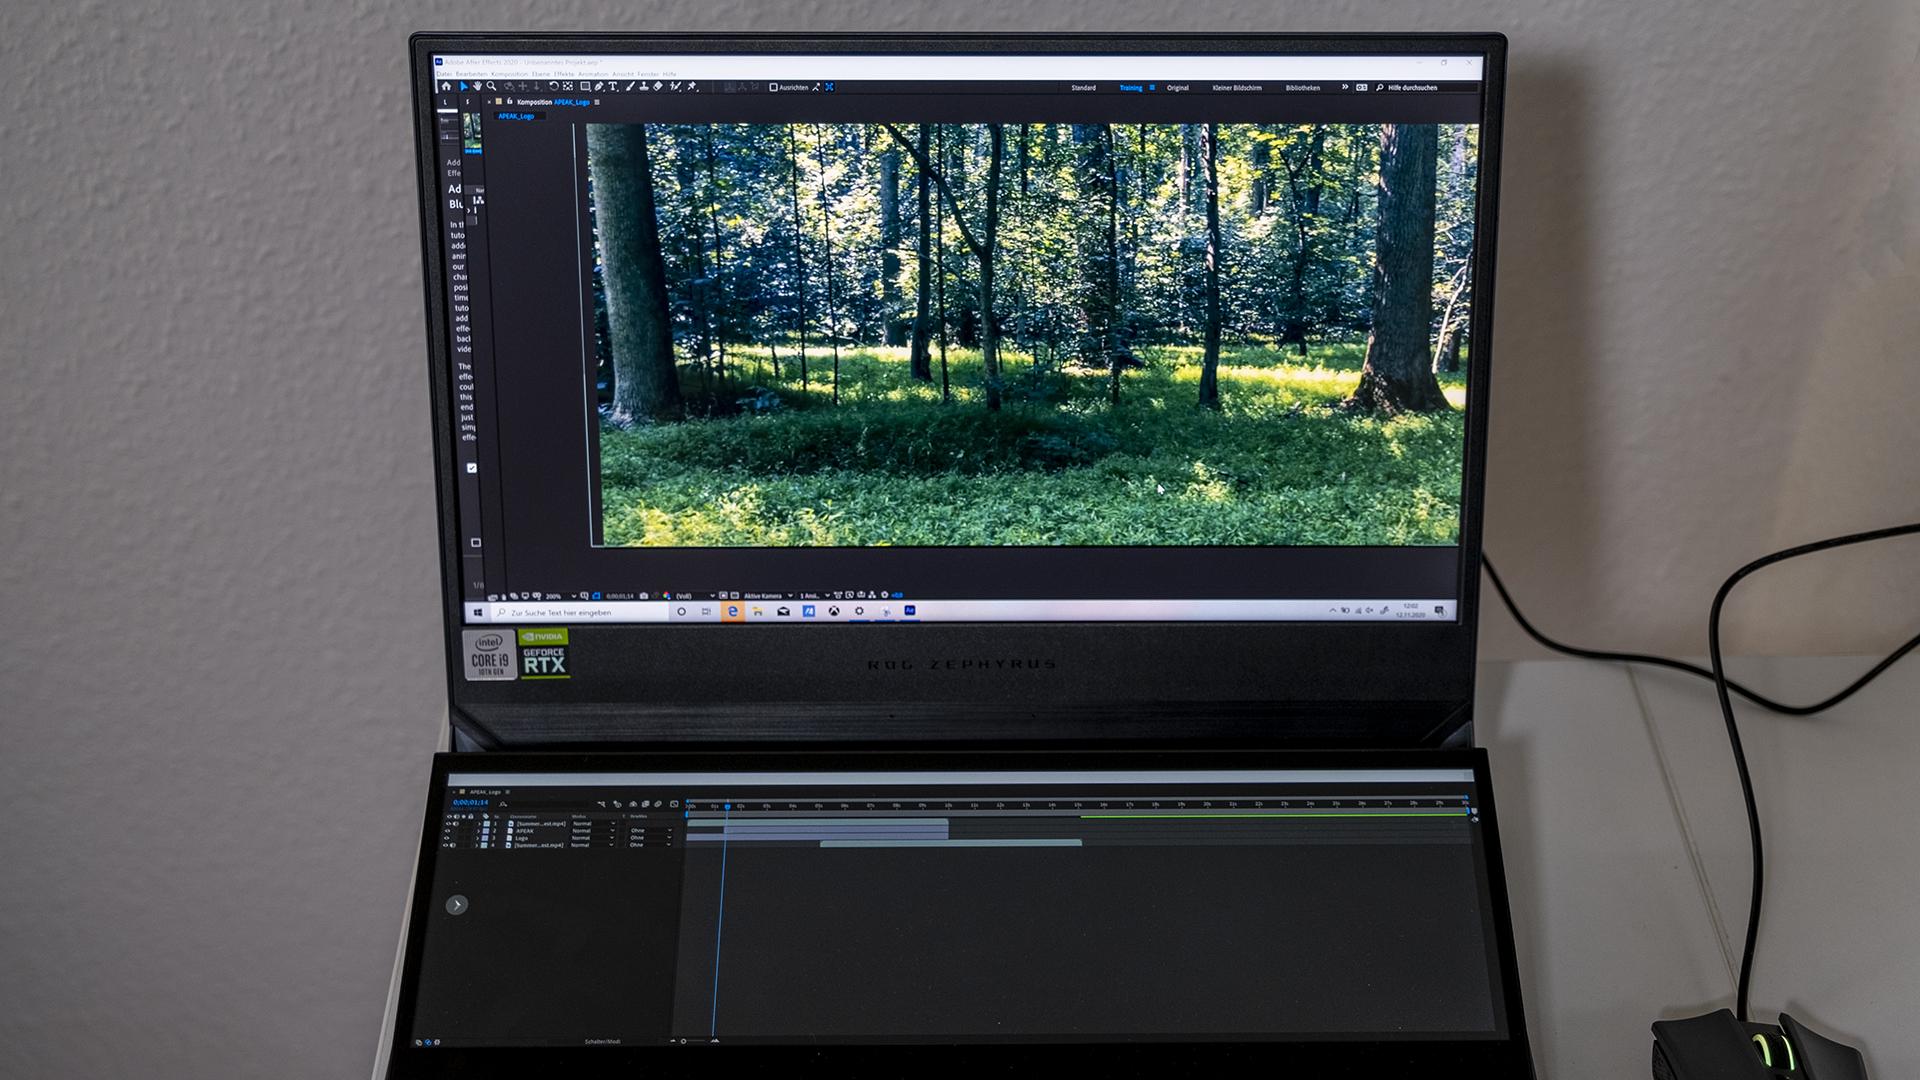 ASUS ROG Zepyhrus DUO 15 GX550 Zweitdisplay After Effects Workflow